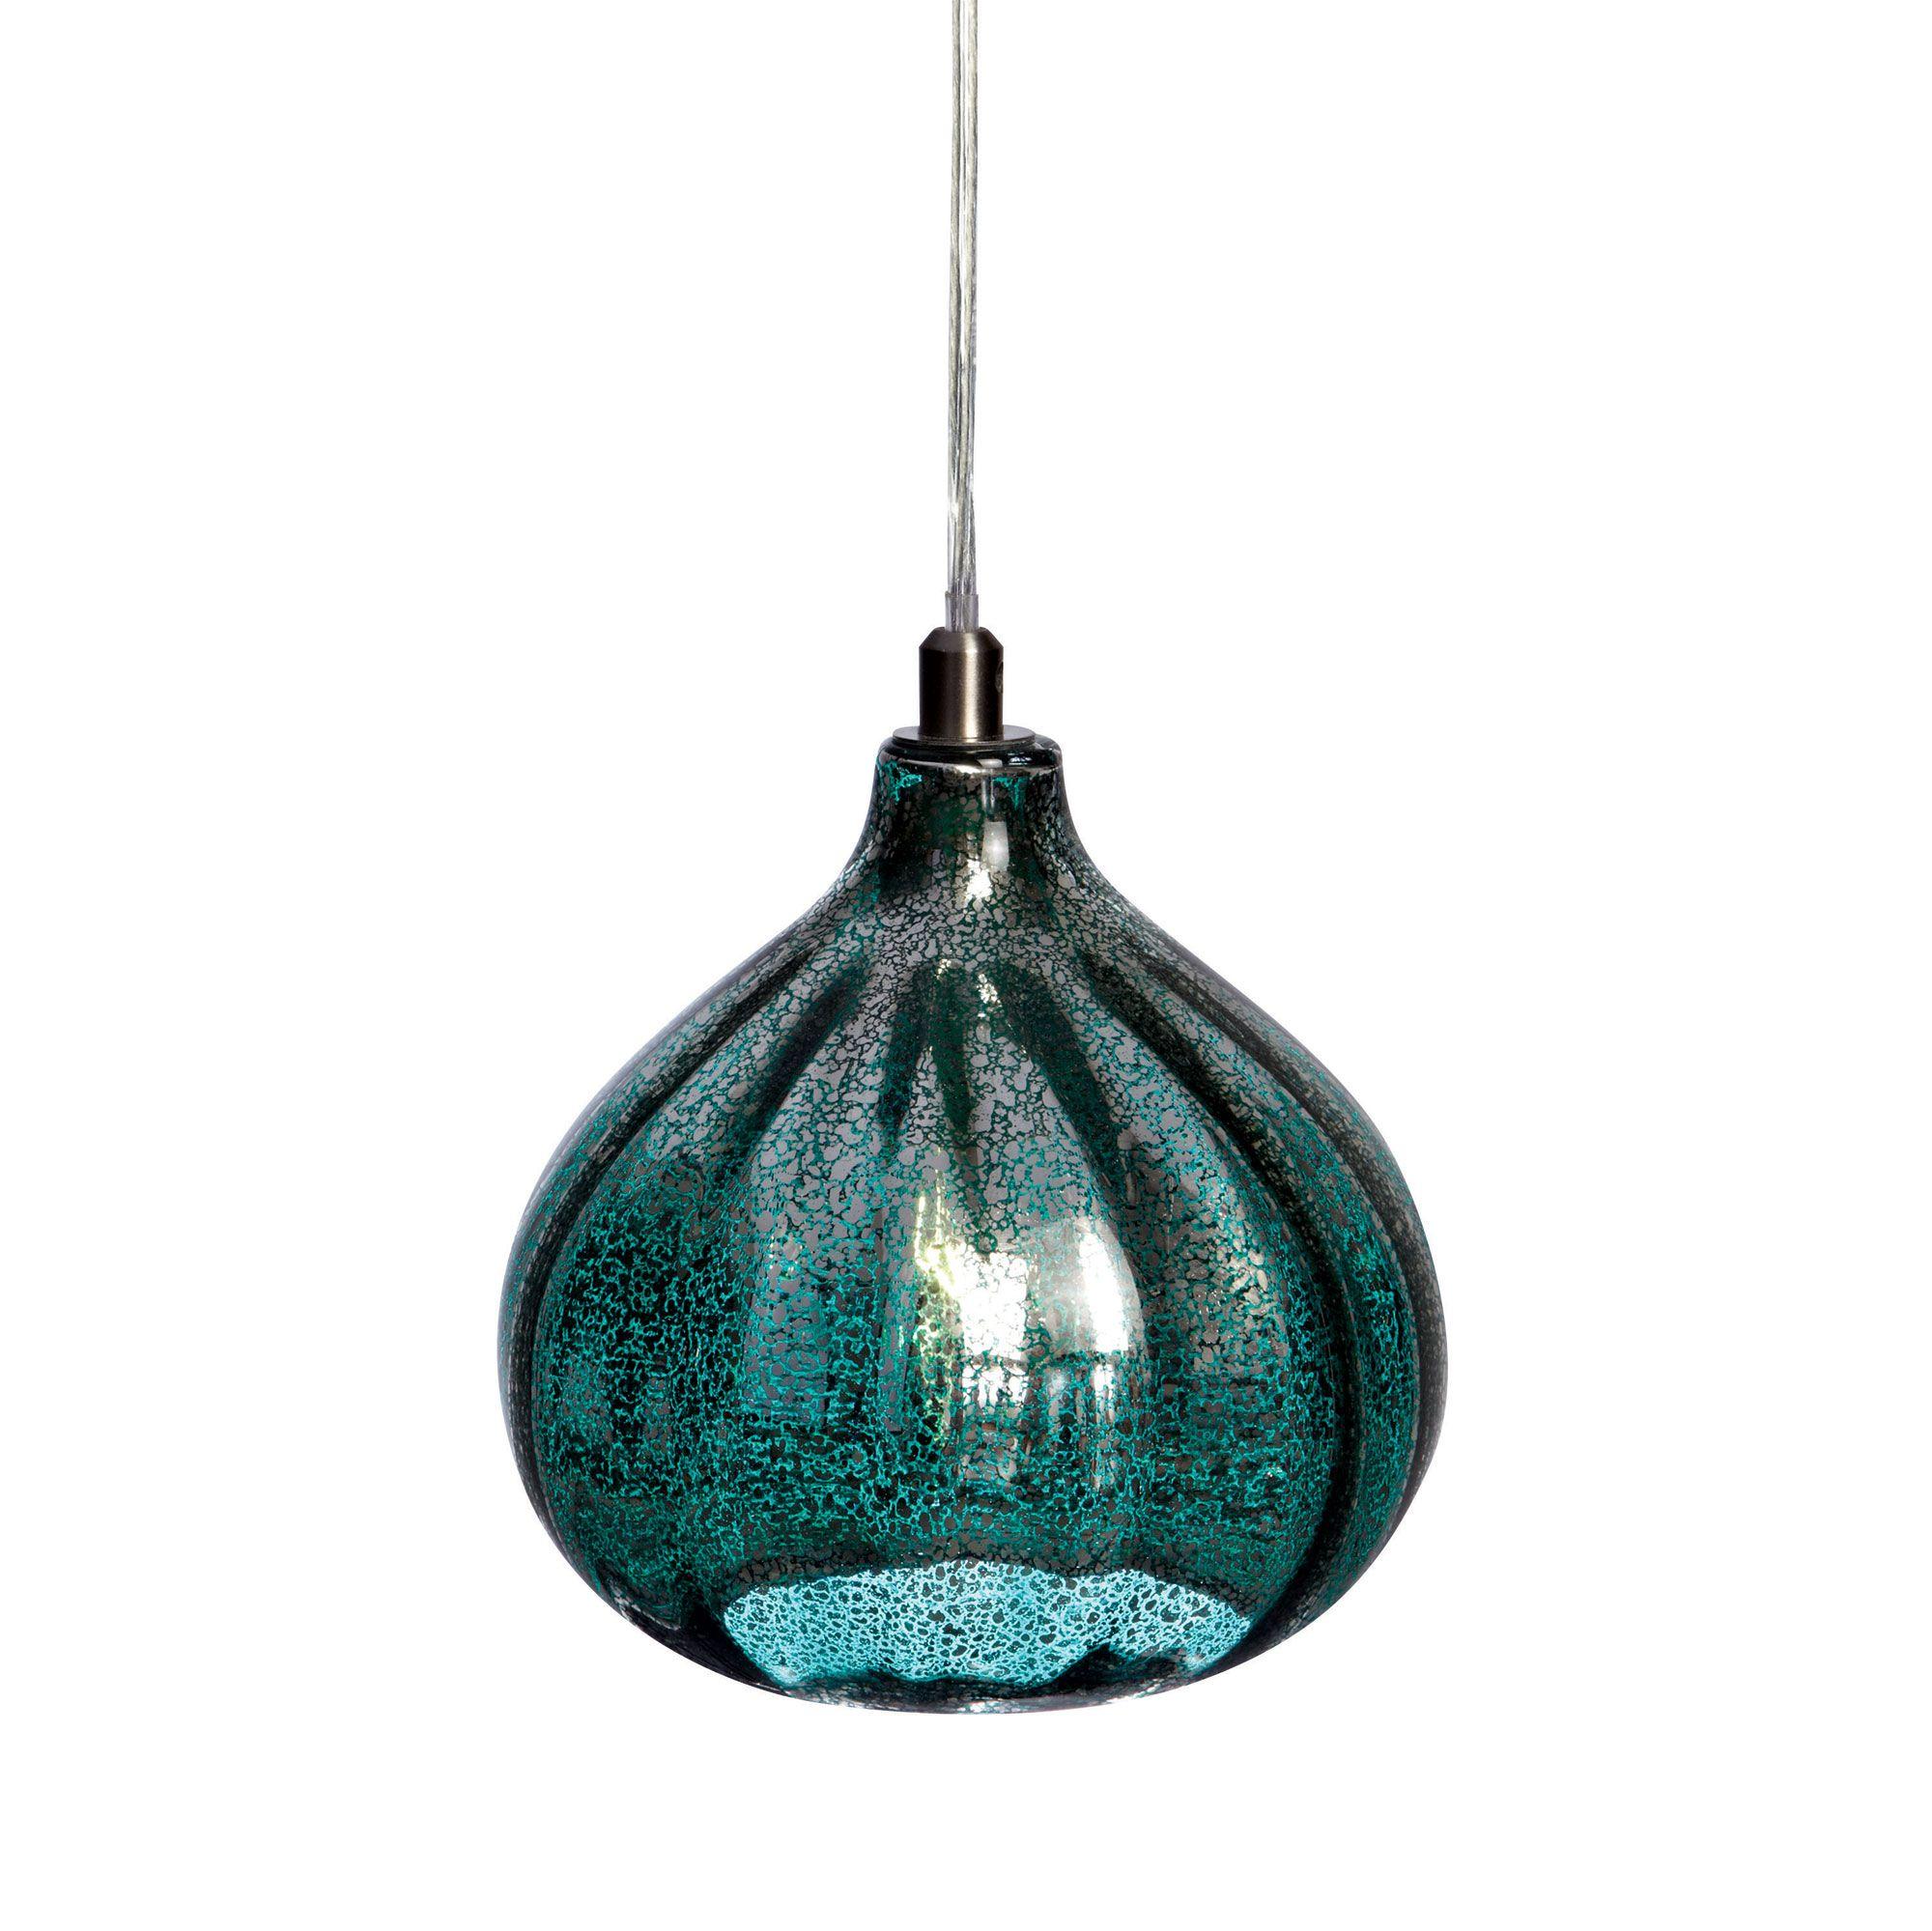 suspension forme goutte d 39 eau en verre souffl bombay markslojd ethnique pinterest. Black Bedroom Furniture Sets. Home Design Ideas